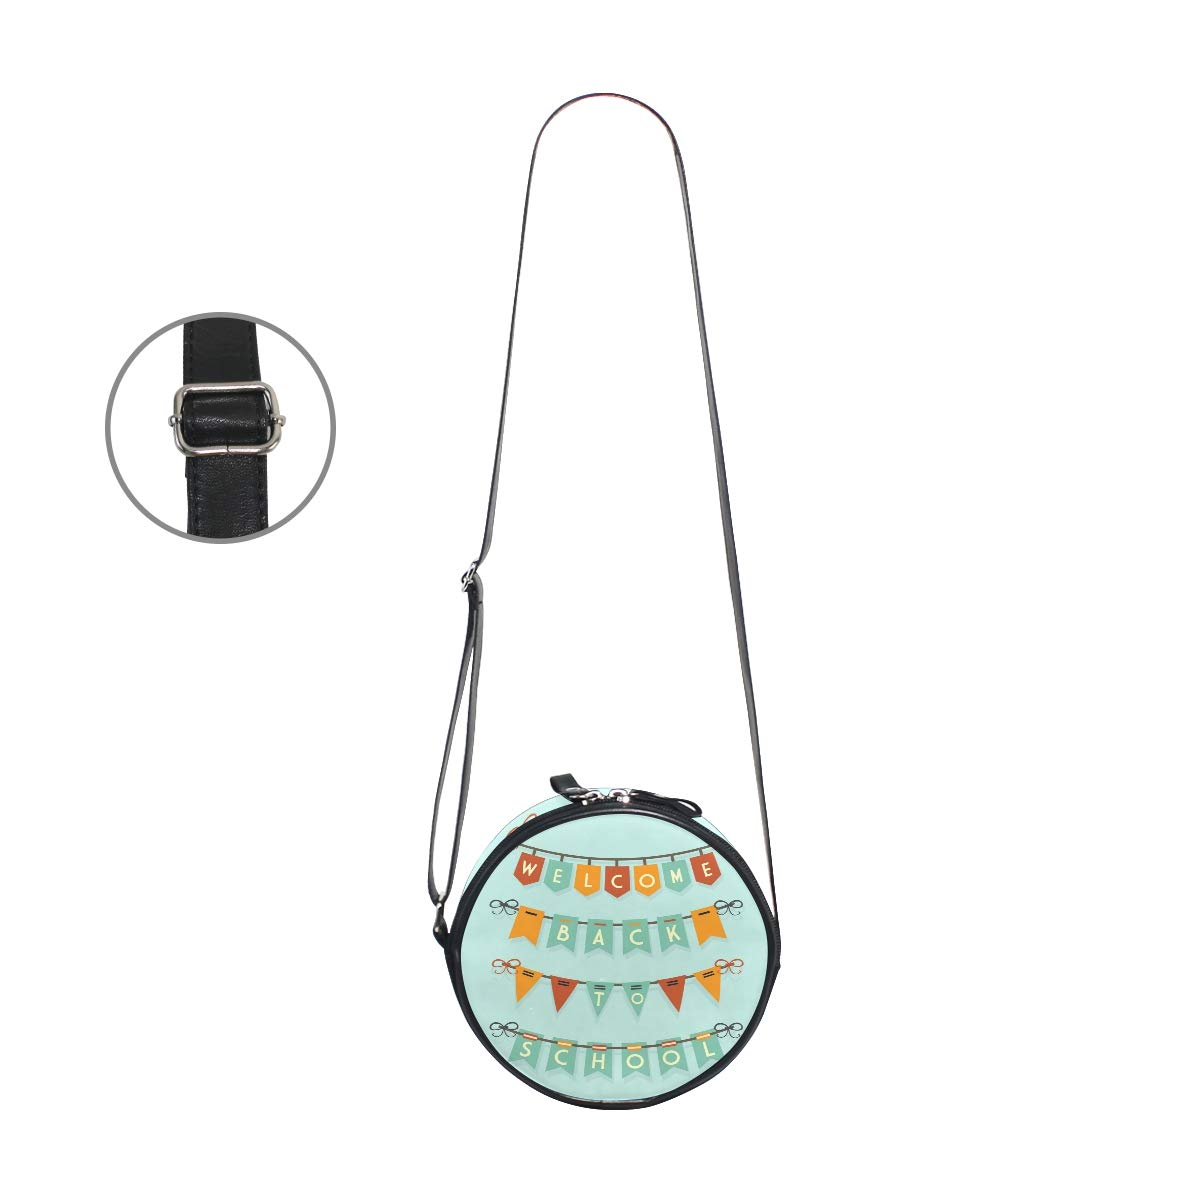 KEAKIA Back To School Buntings Round Crossbody Bag Shoulder Sling Bag Handbag Purse Satchel Shoulder Bag for Kids Women